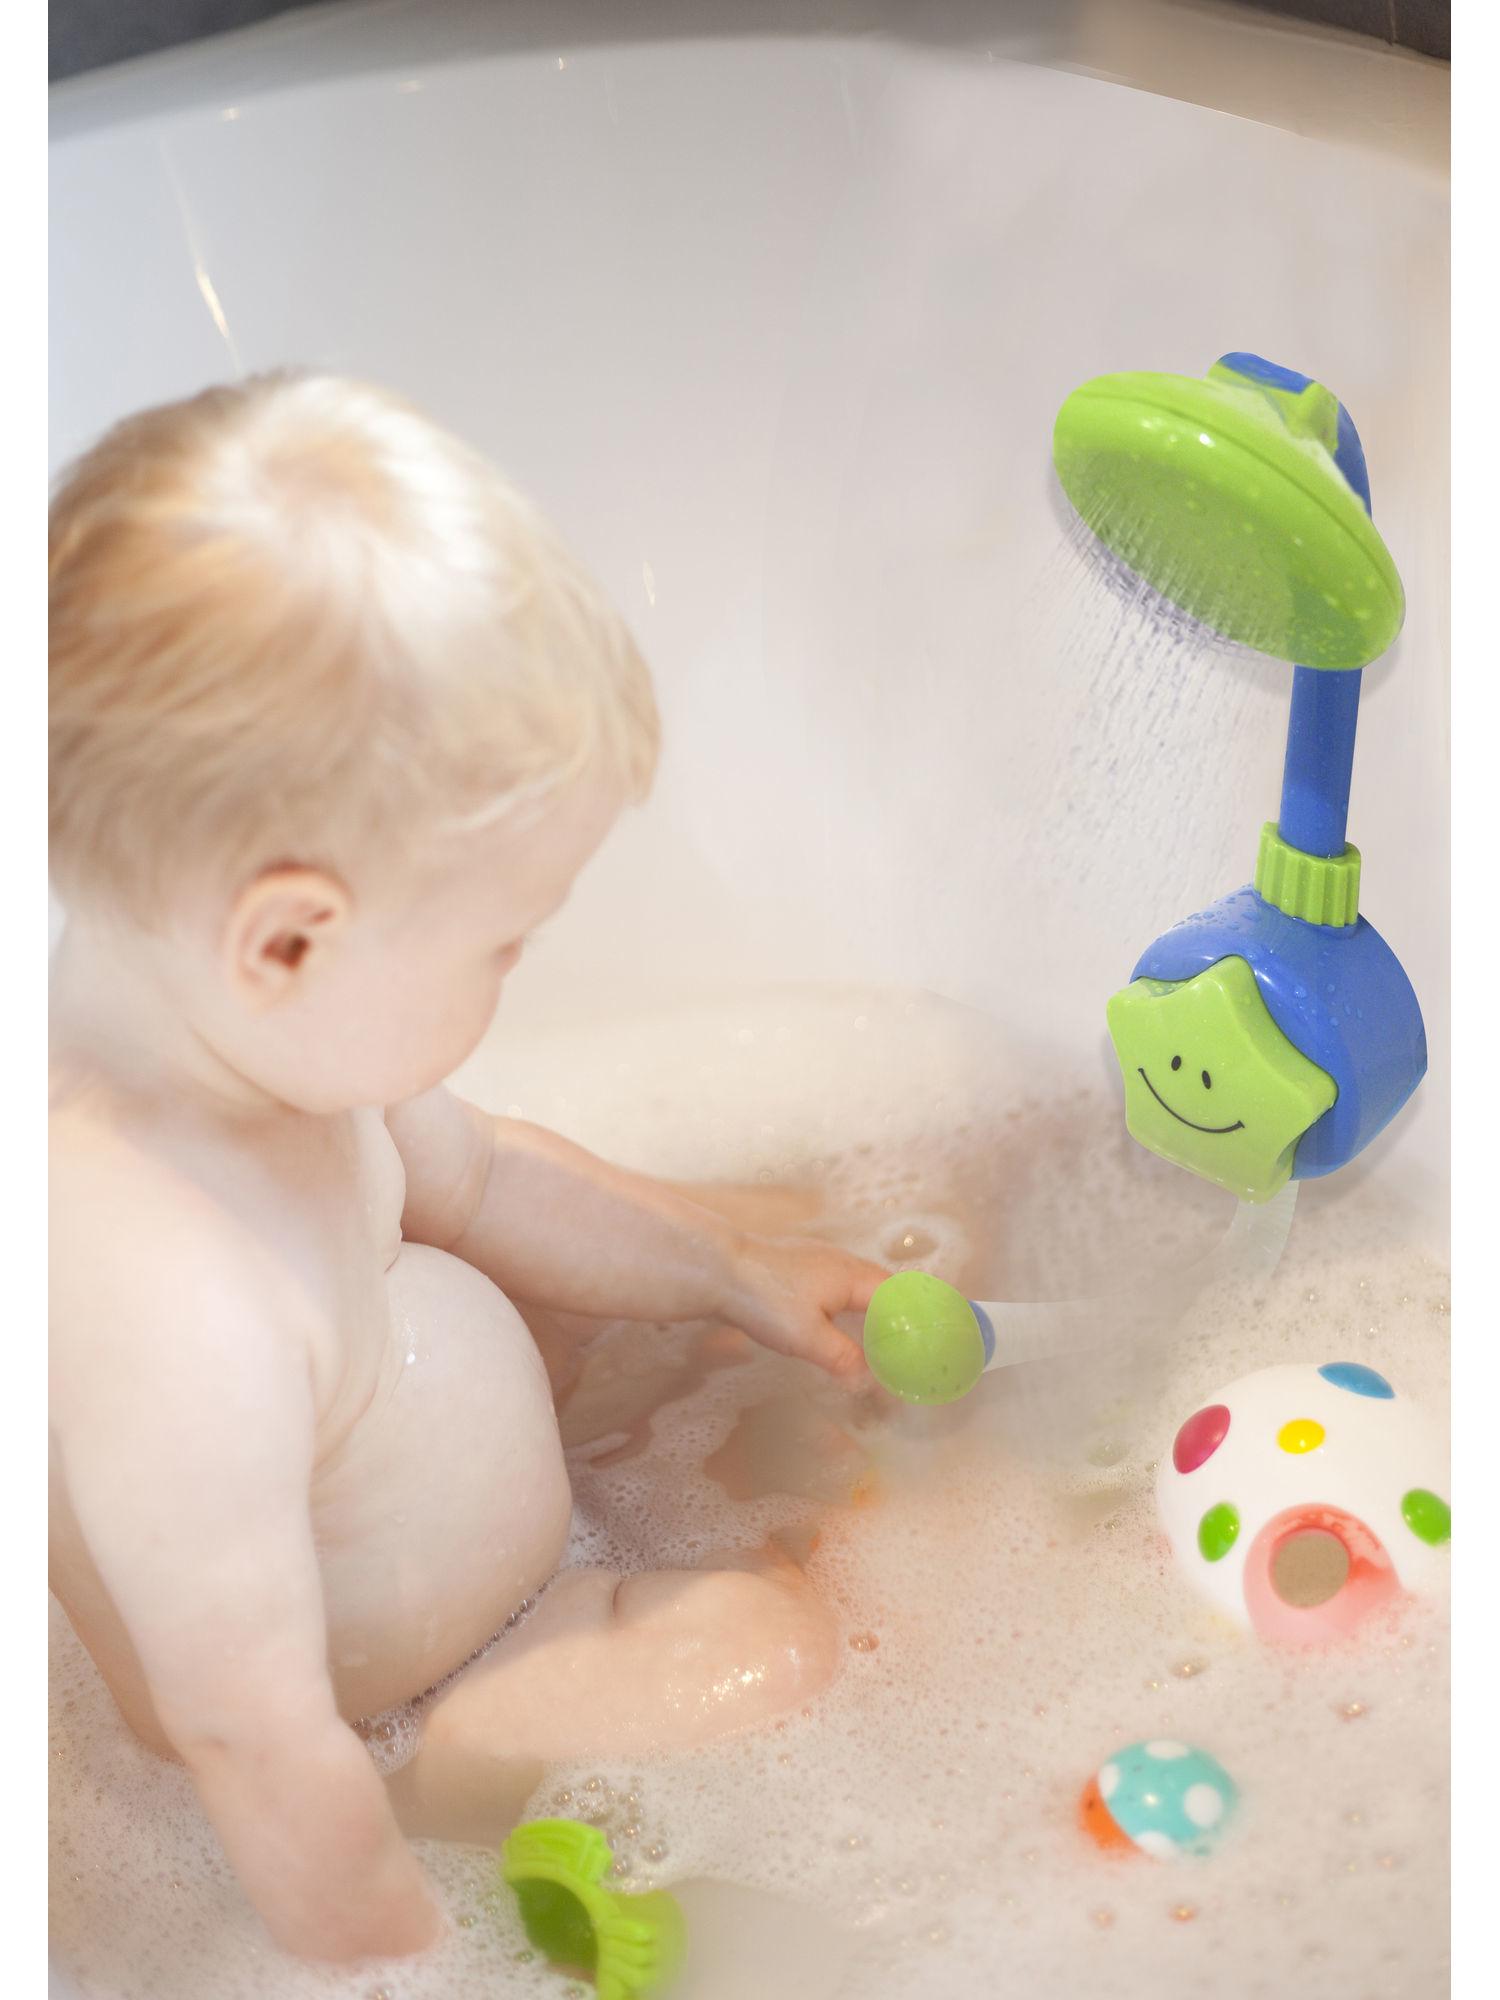 Koo-Di Bath Time Fun Shower Baby Bath Toy